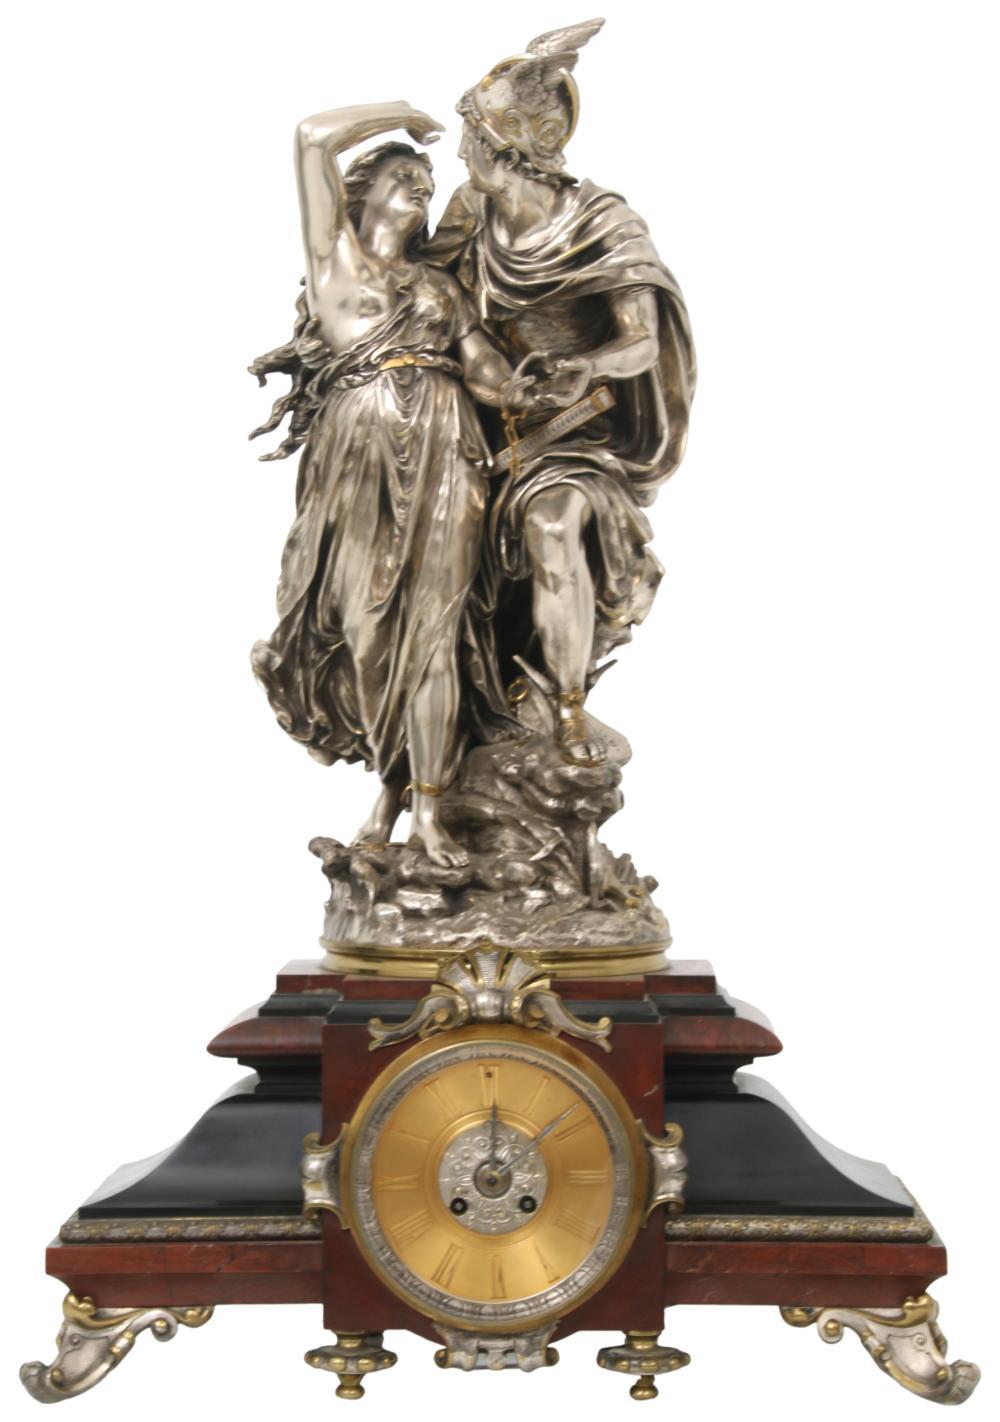 Jean-Louis Gregoire French Mantel Clock